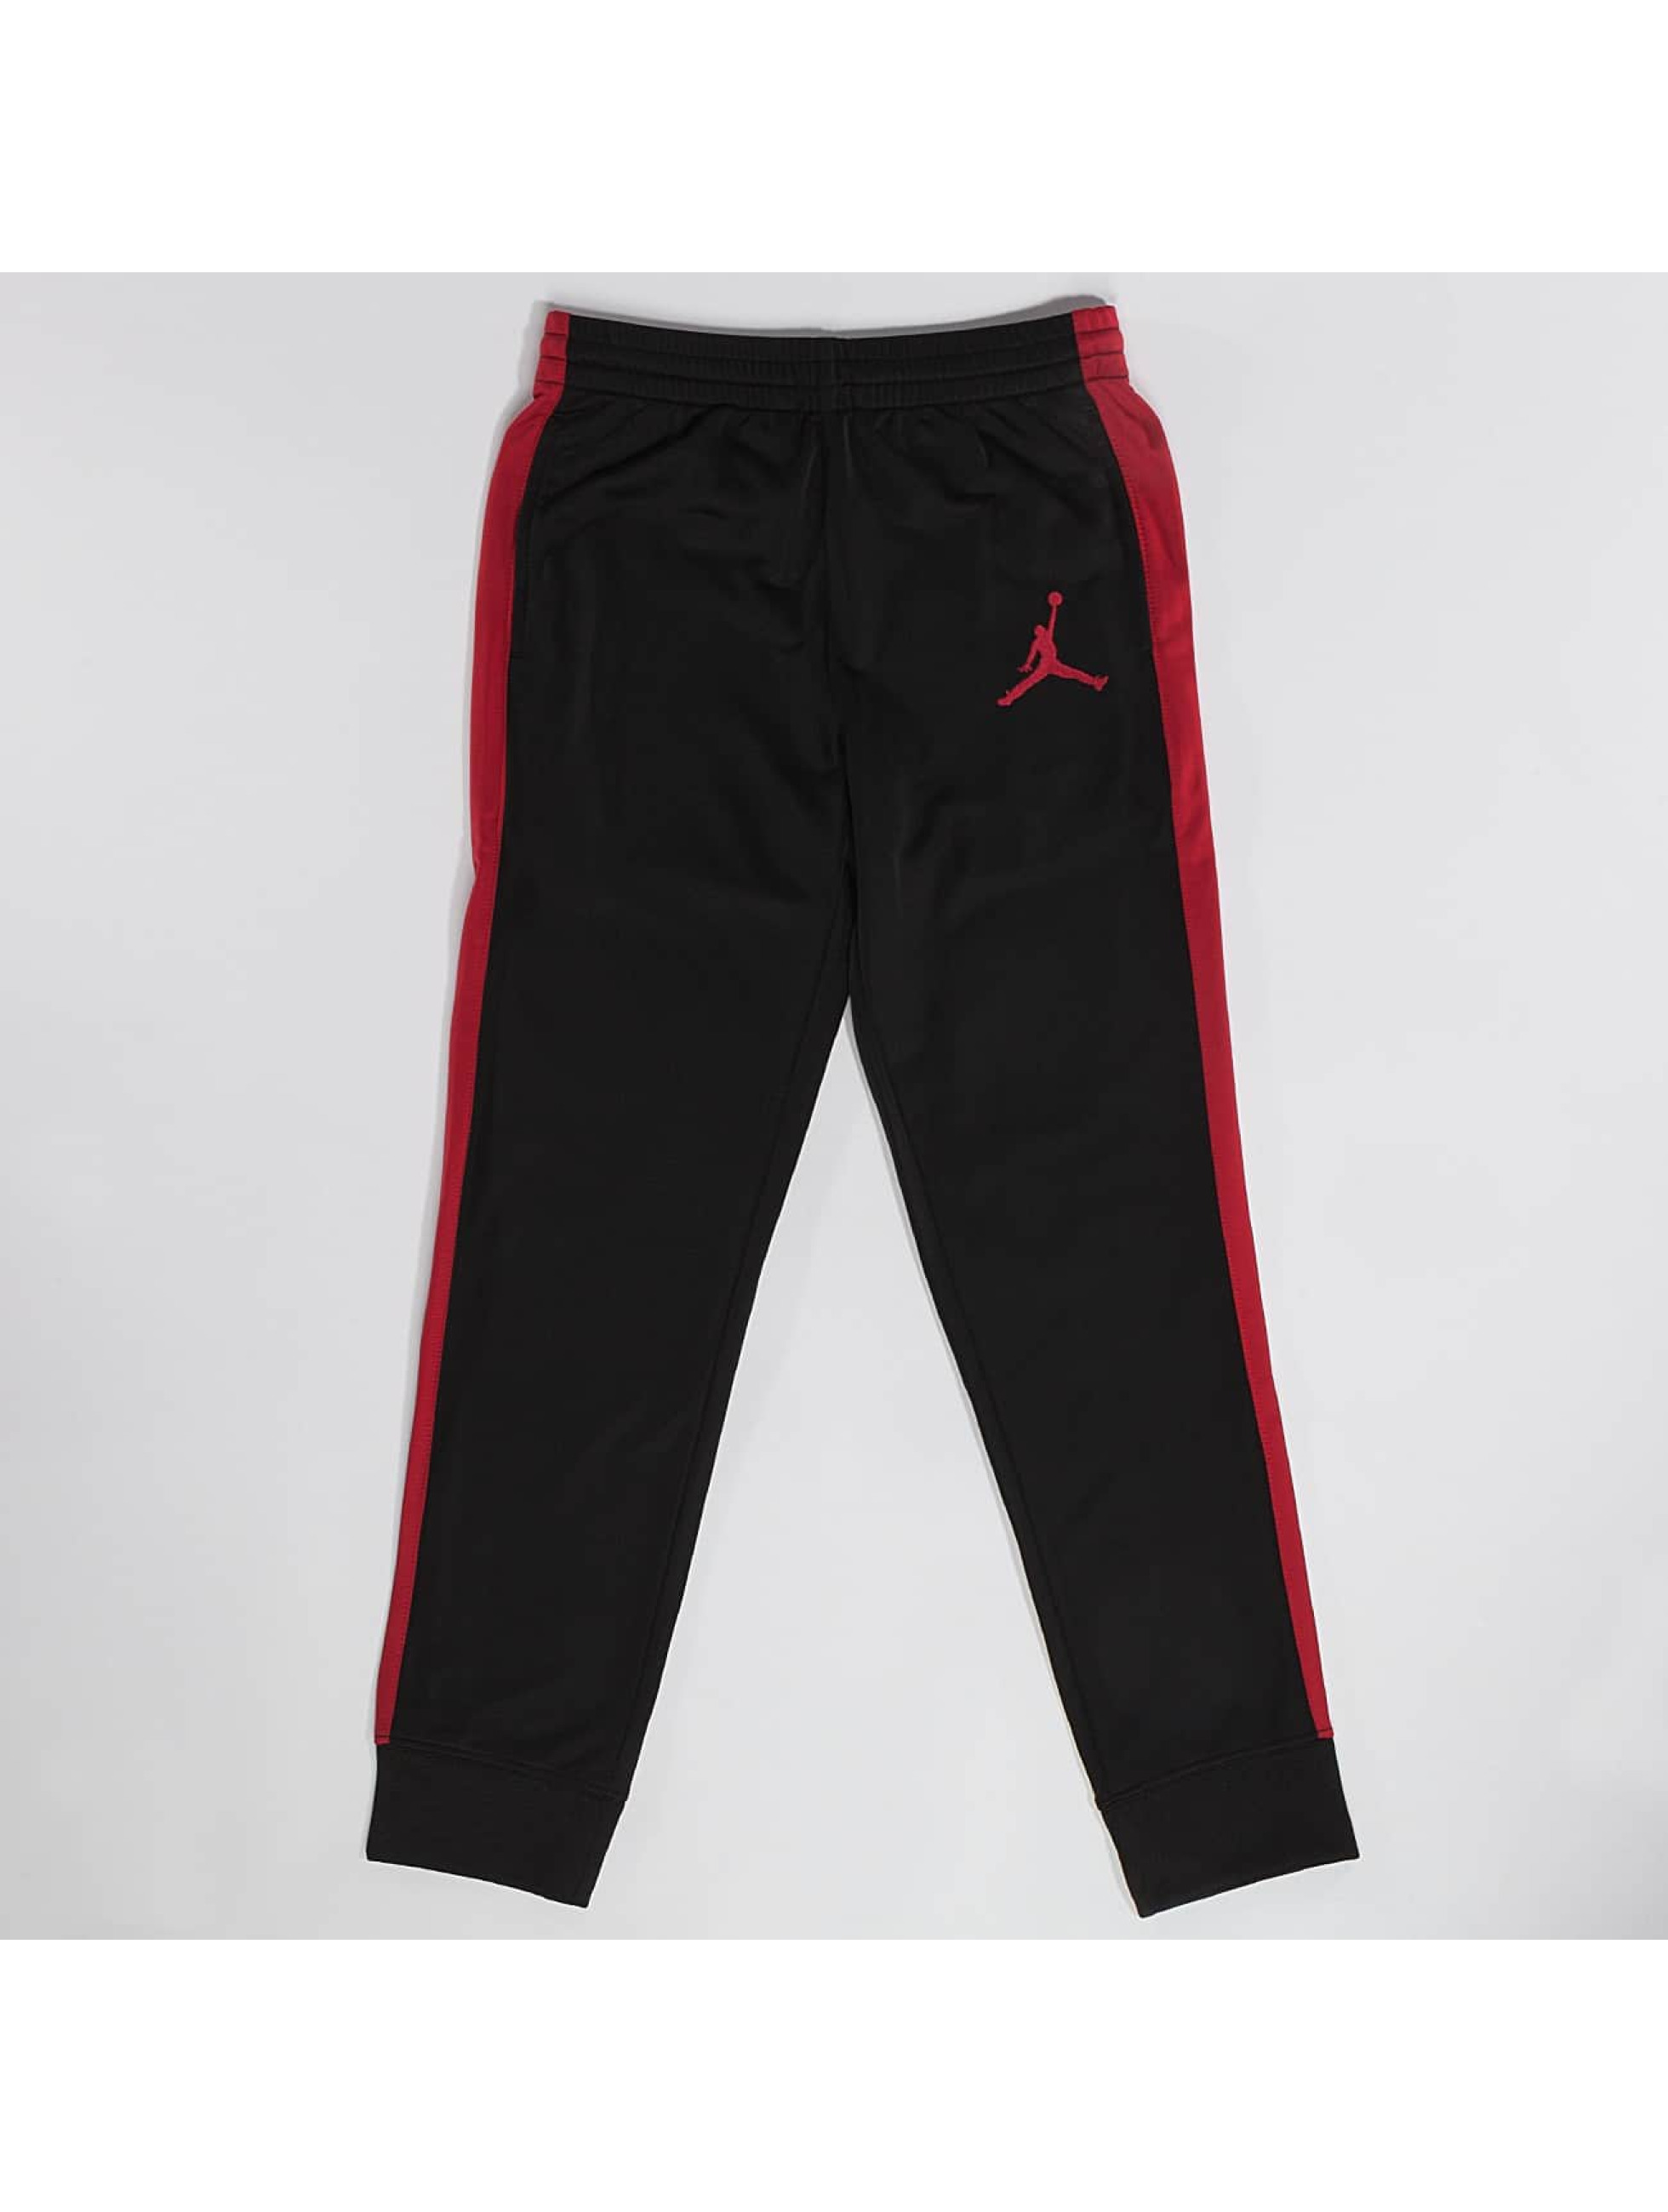 Jordan Kinder Jogginghose AJ Legacy in schwarz